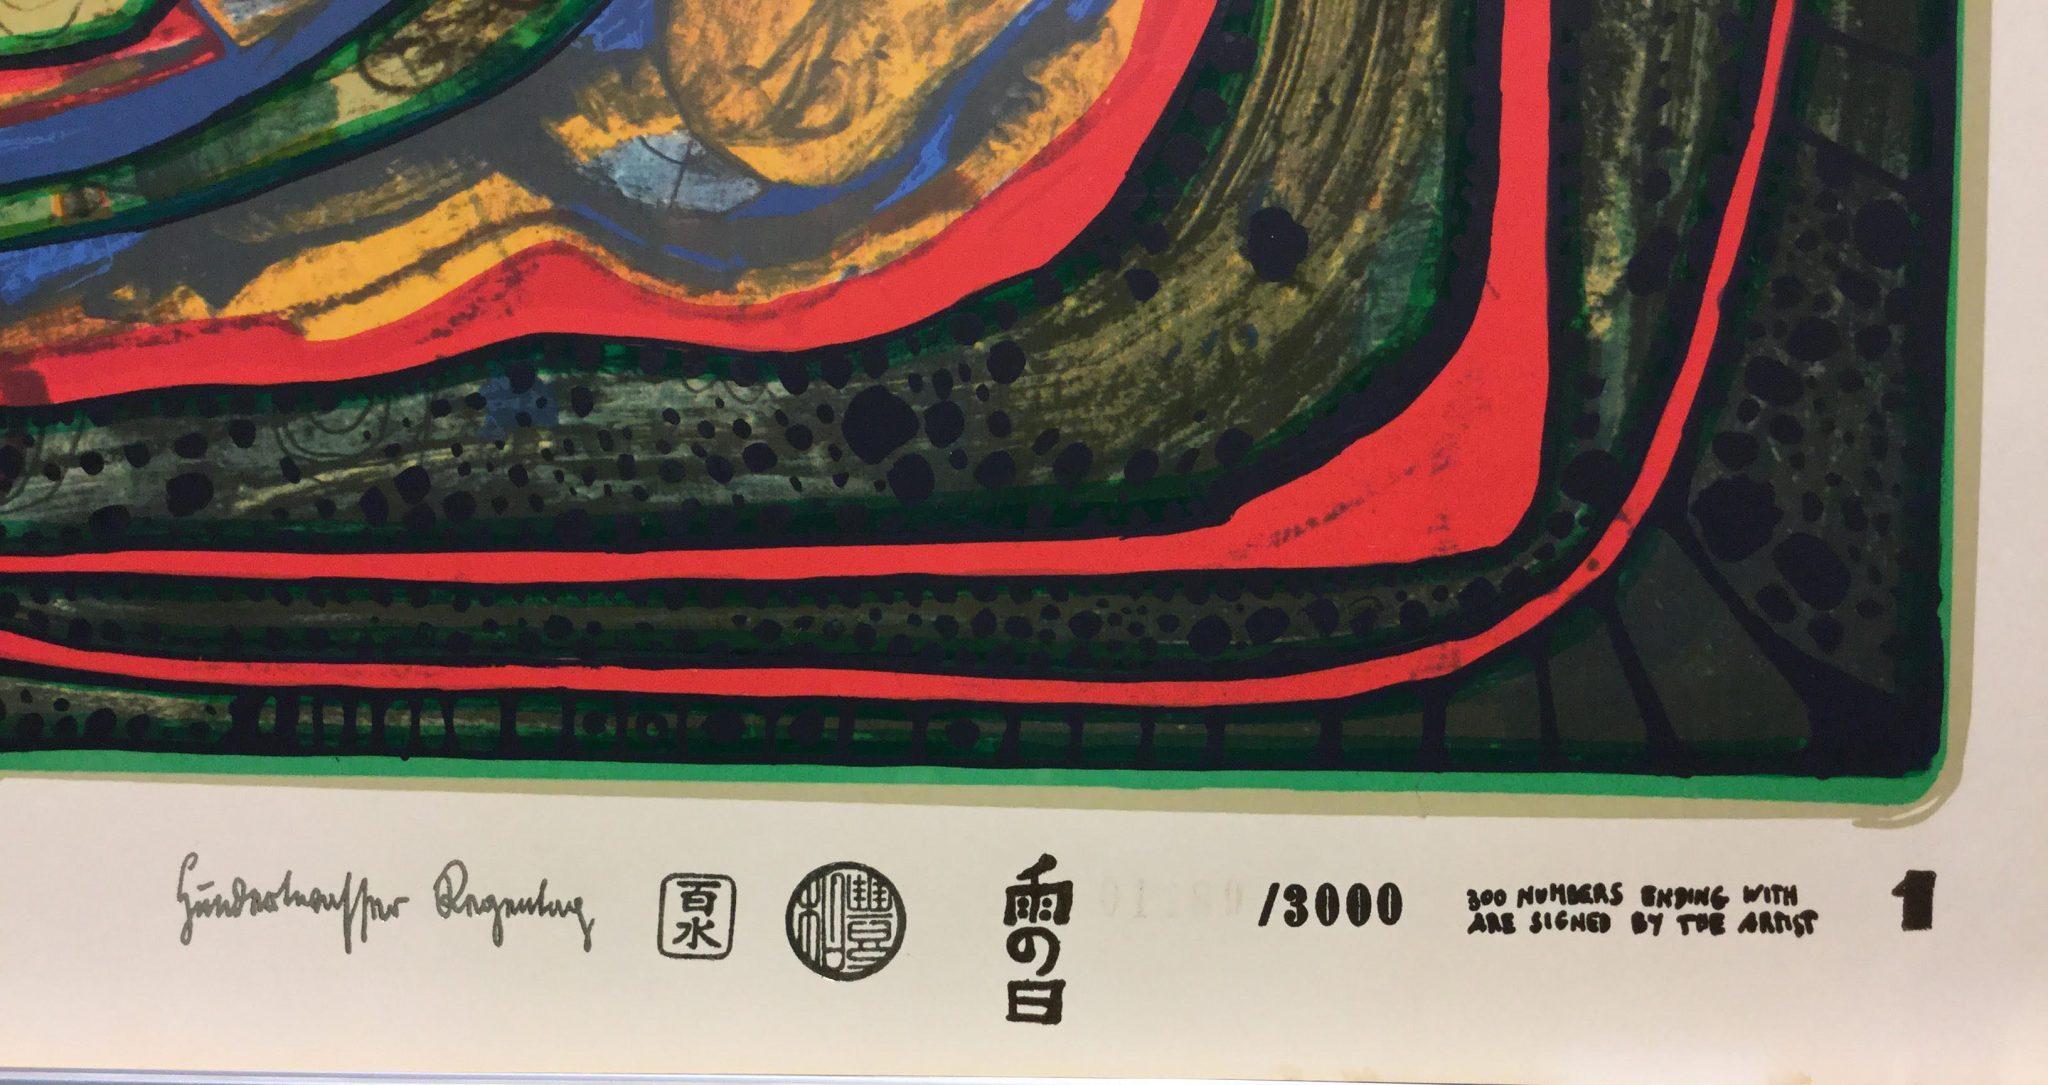 Hundertwasser sérigraphie Regentag portfolio Gravure sur bois, lithographiee estampe